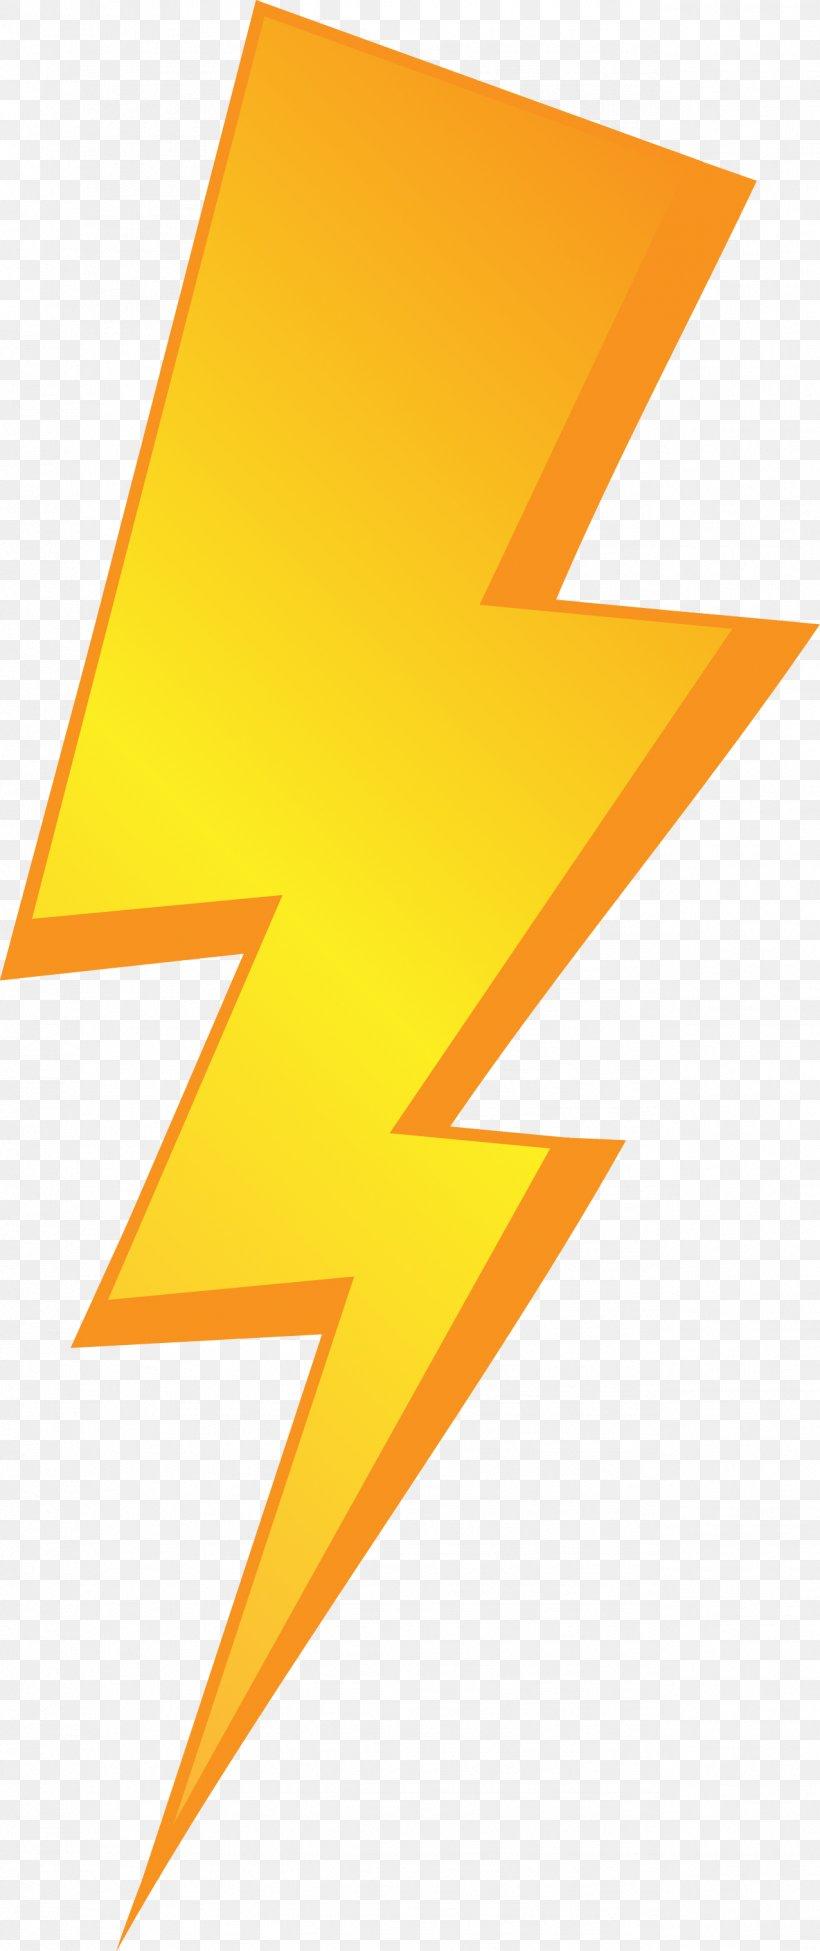 lightning euclidean vector png 1276x3036px lightning computer graphics electricity orange symbol download free lightning euclidean vector png